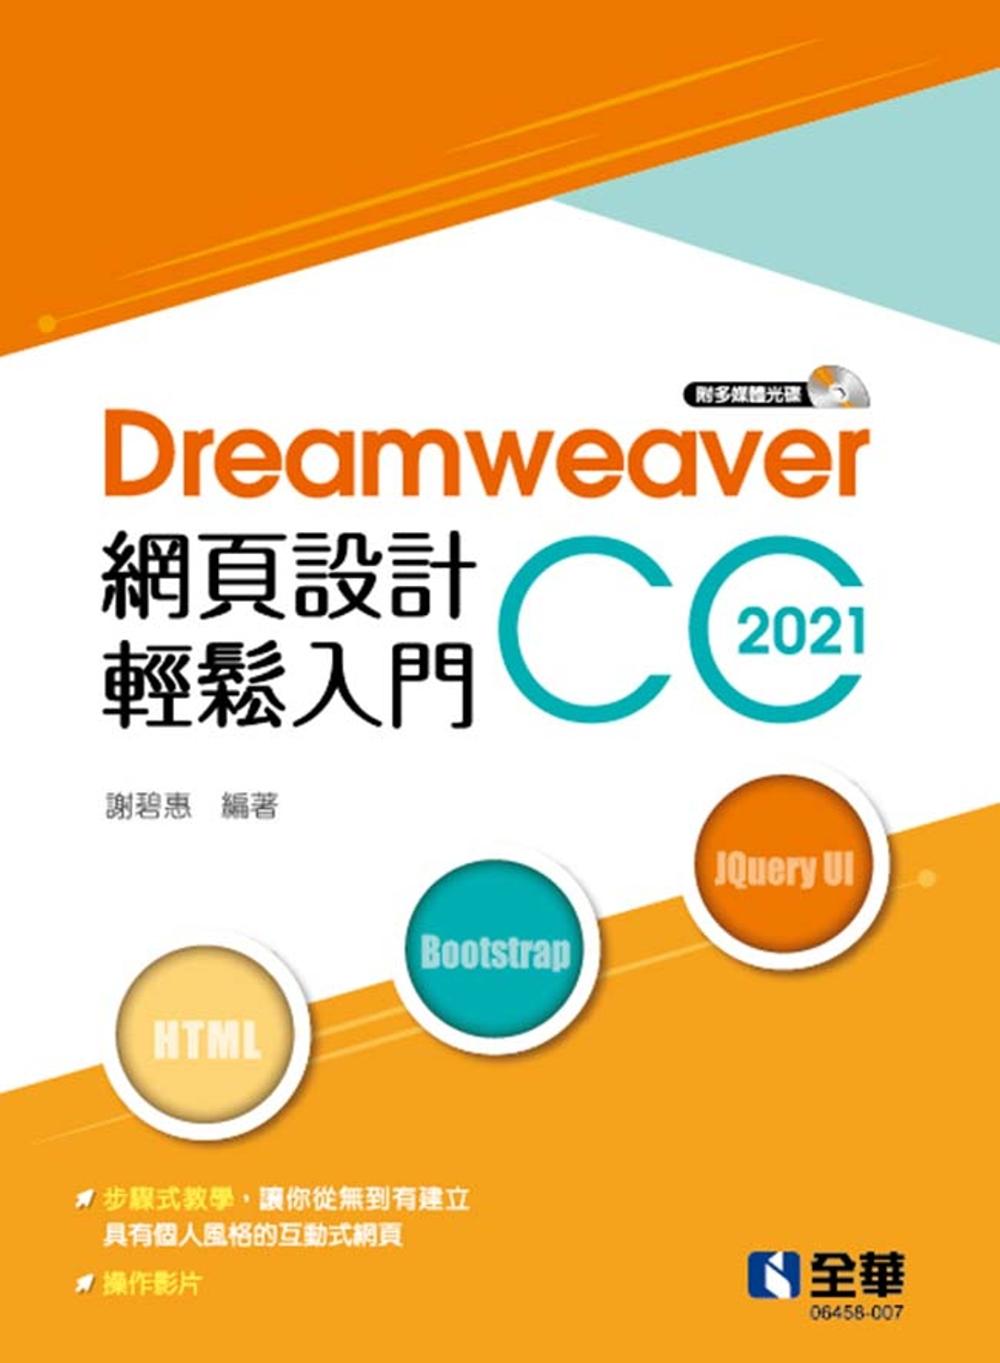 Dreamweaver網頁設計...